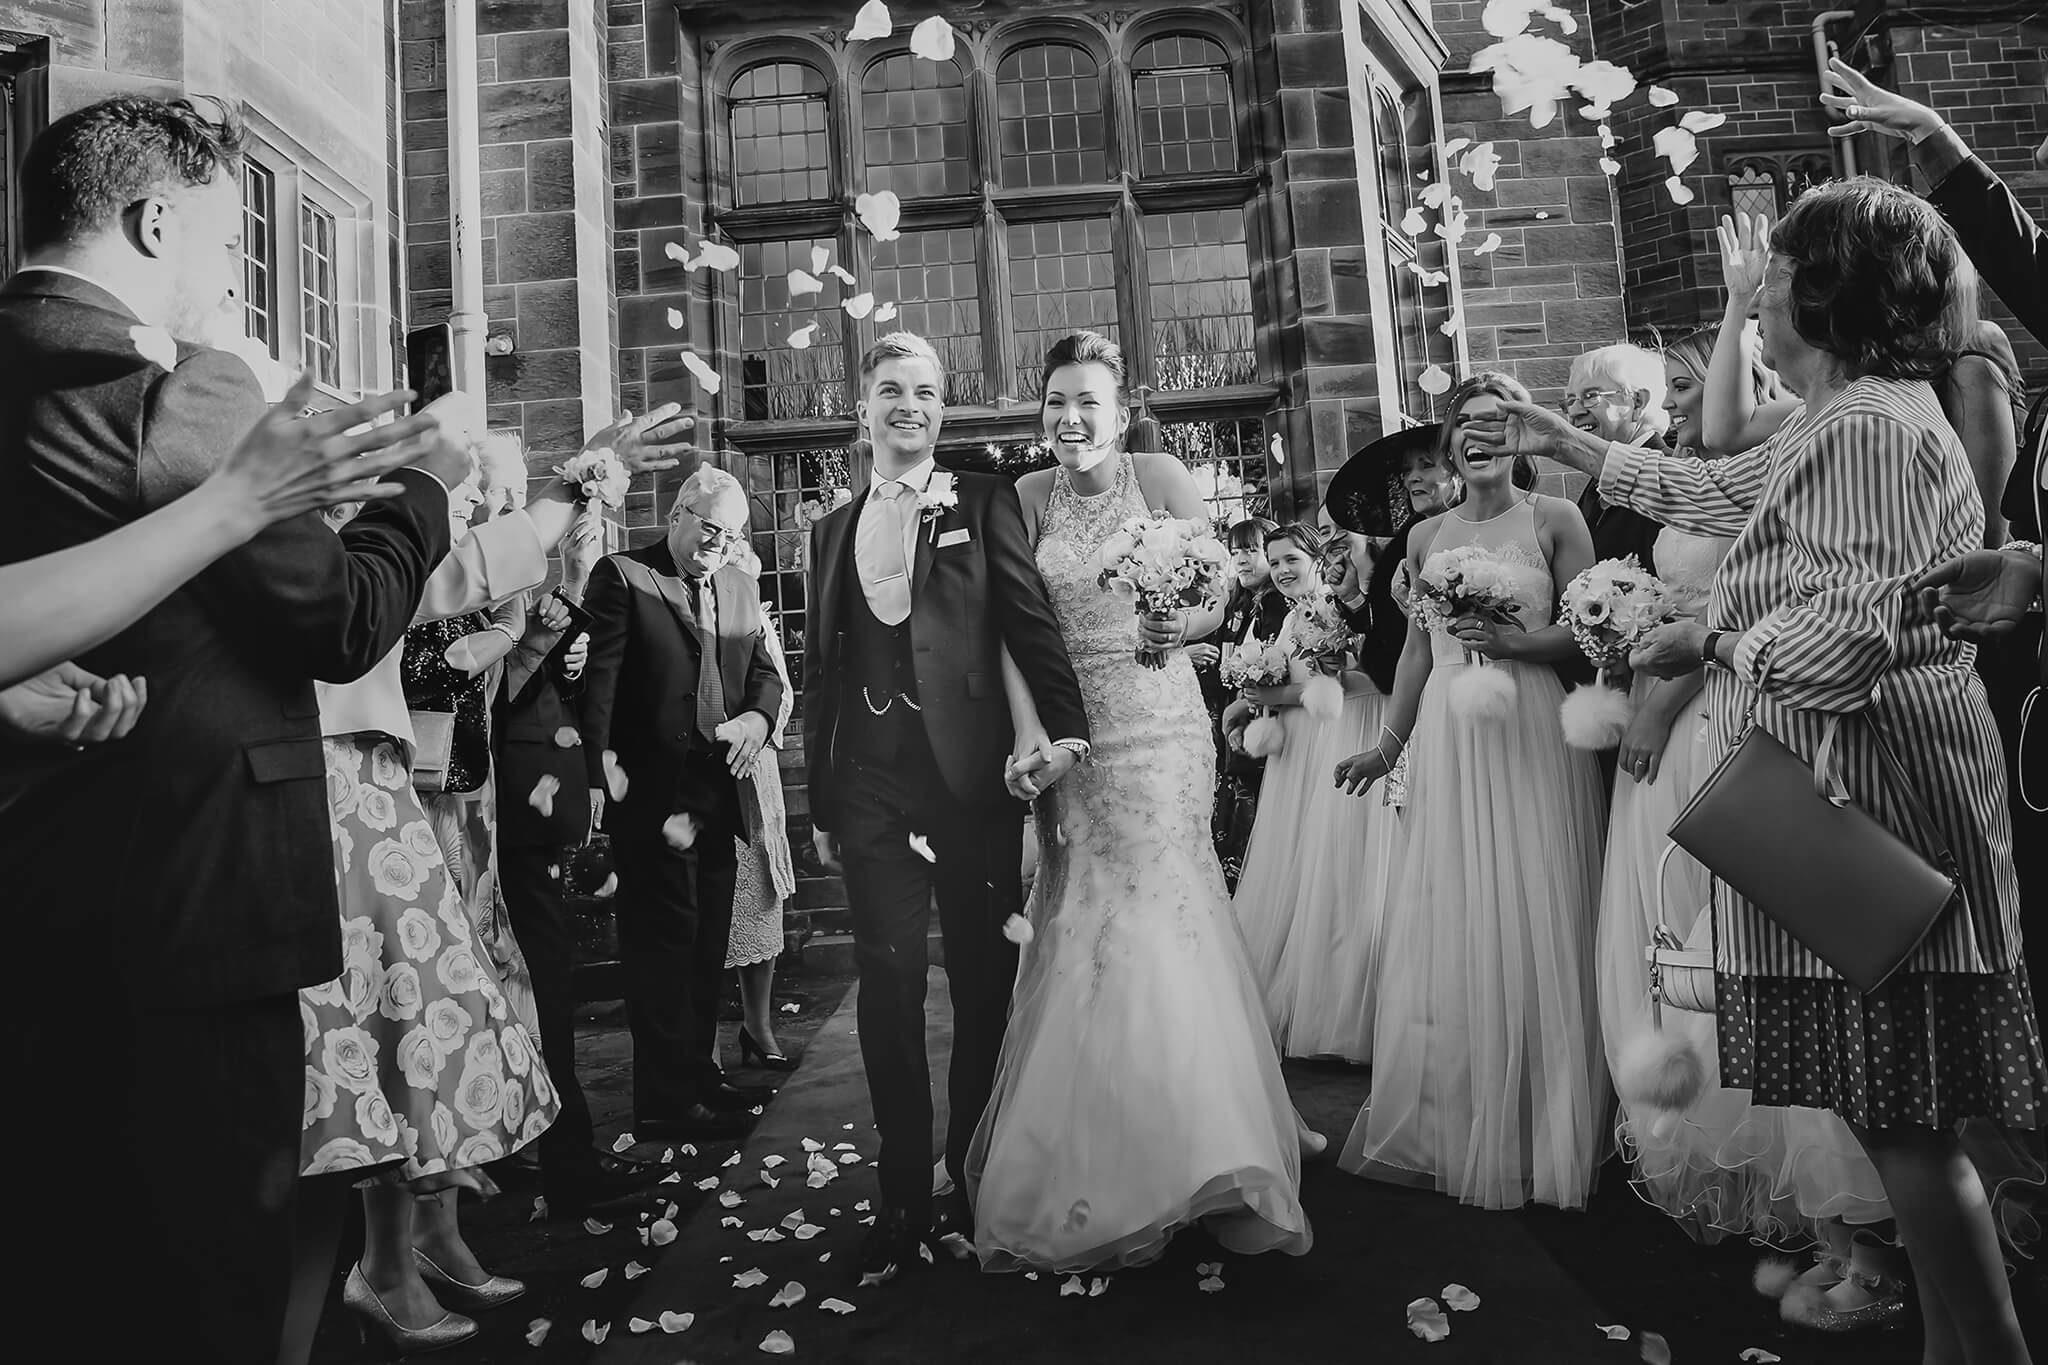 thornton-manor-wedding-photographer-stanbury-photography